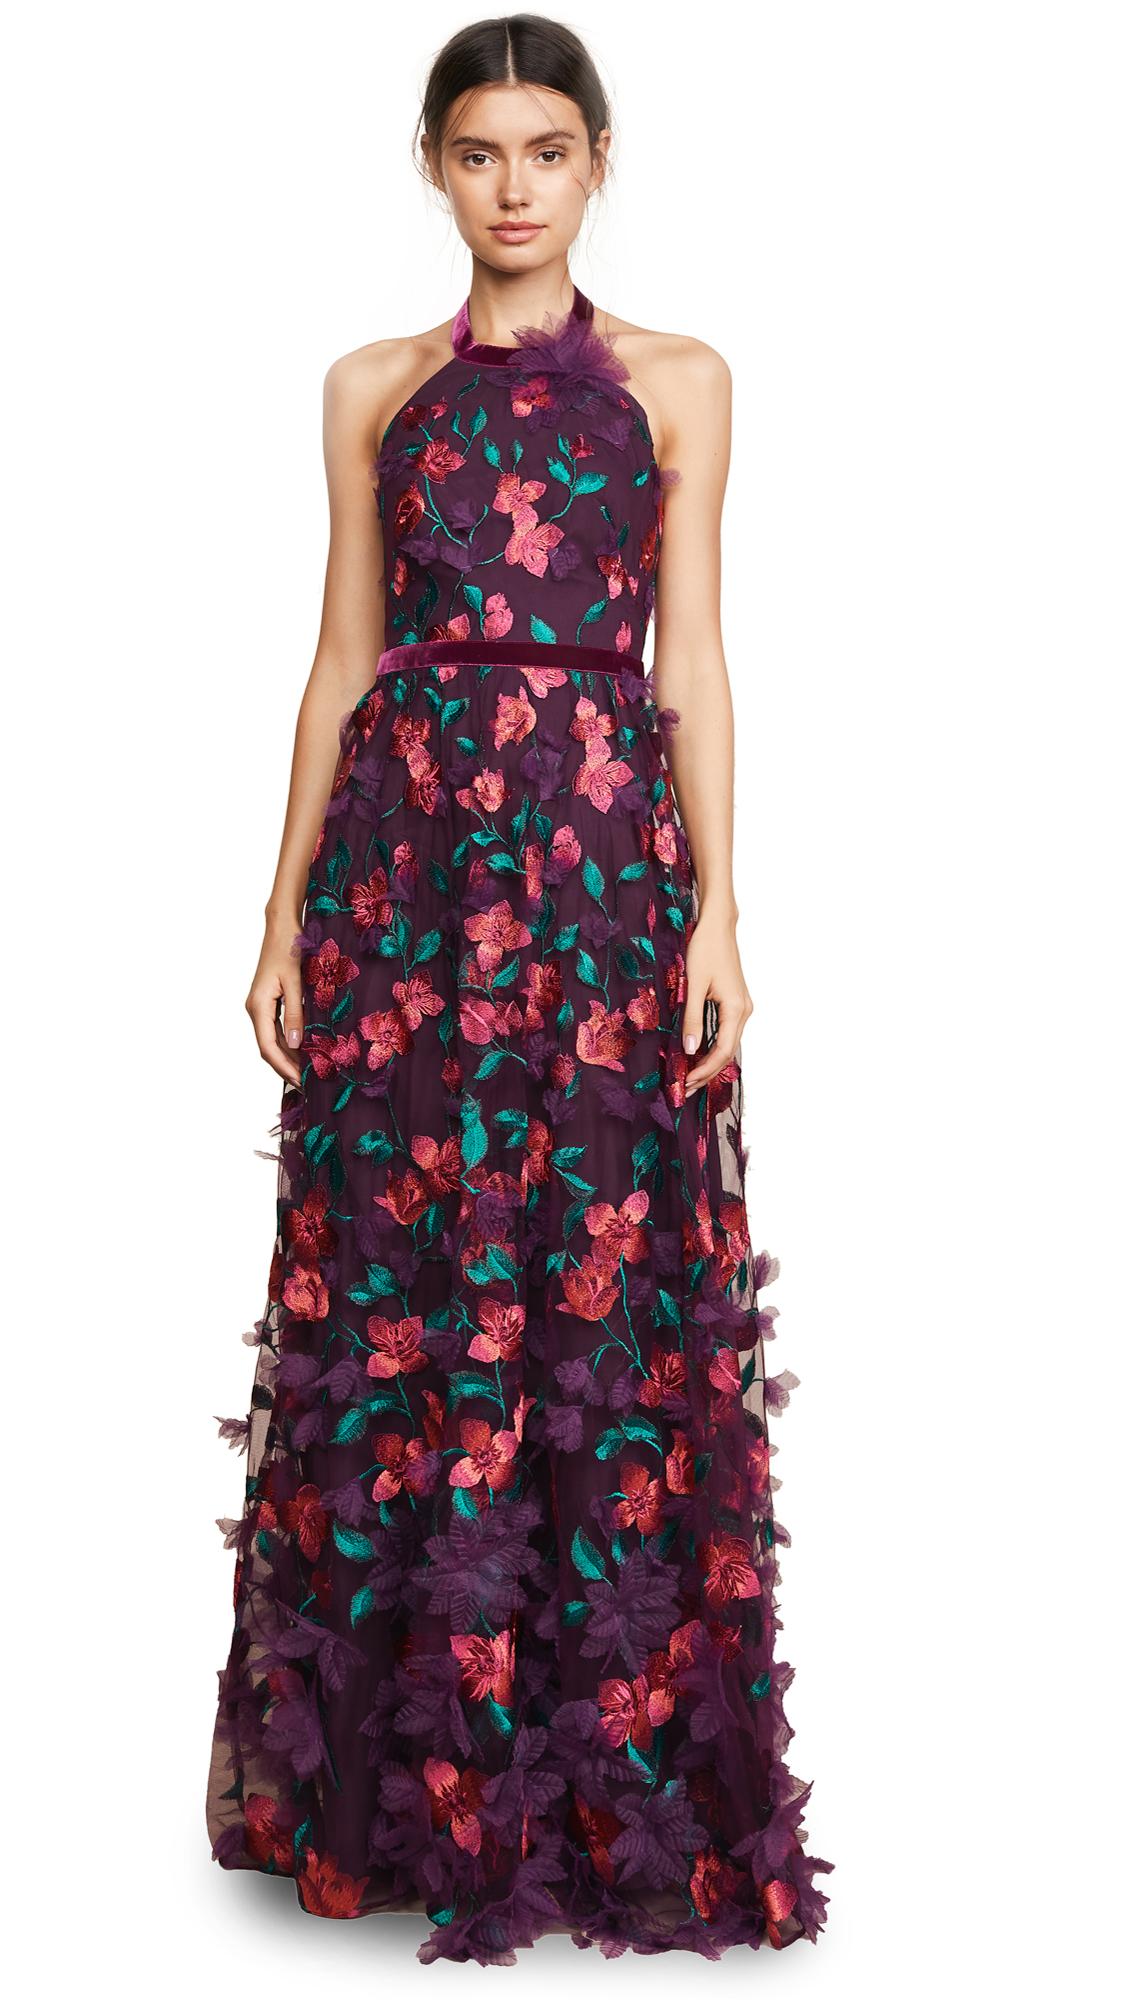 Marchesa Notte Floral Degrade Halter Gown